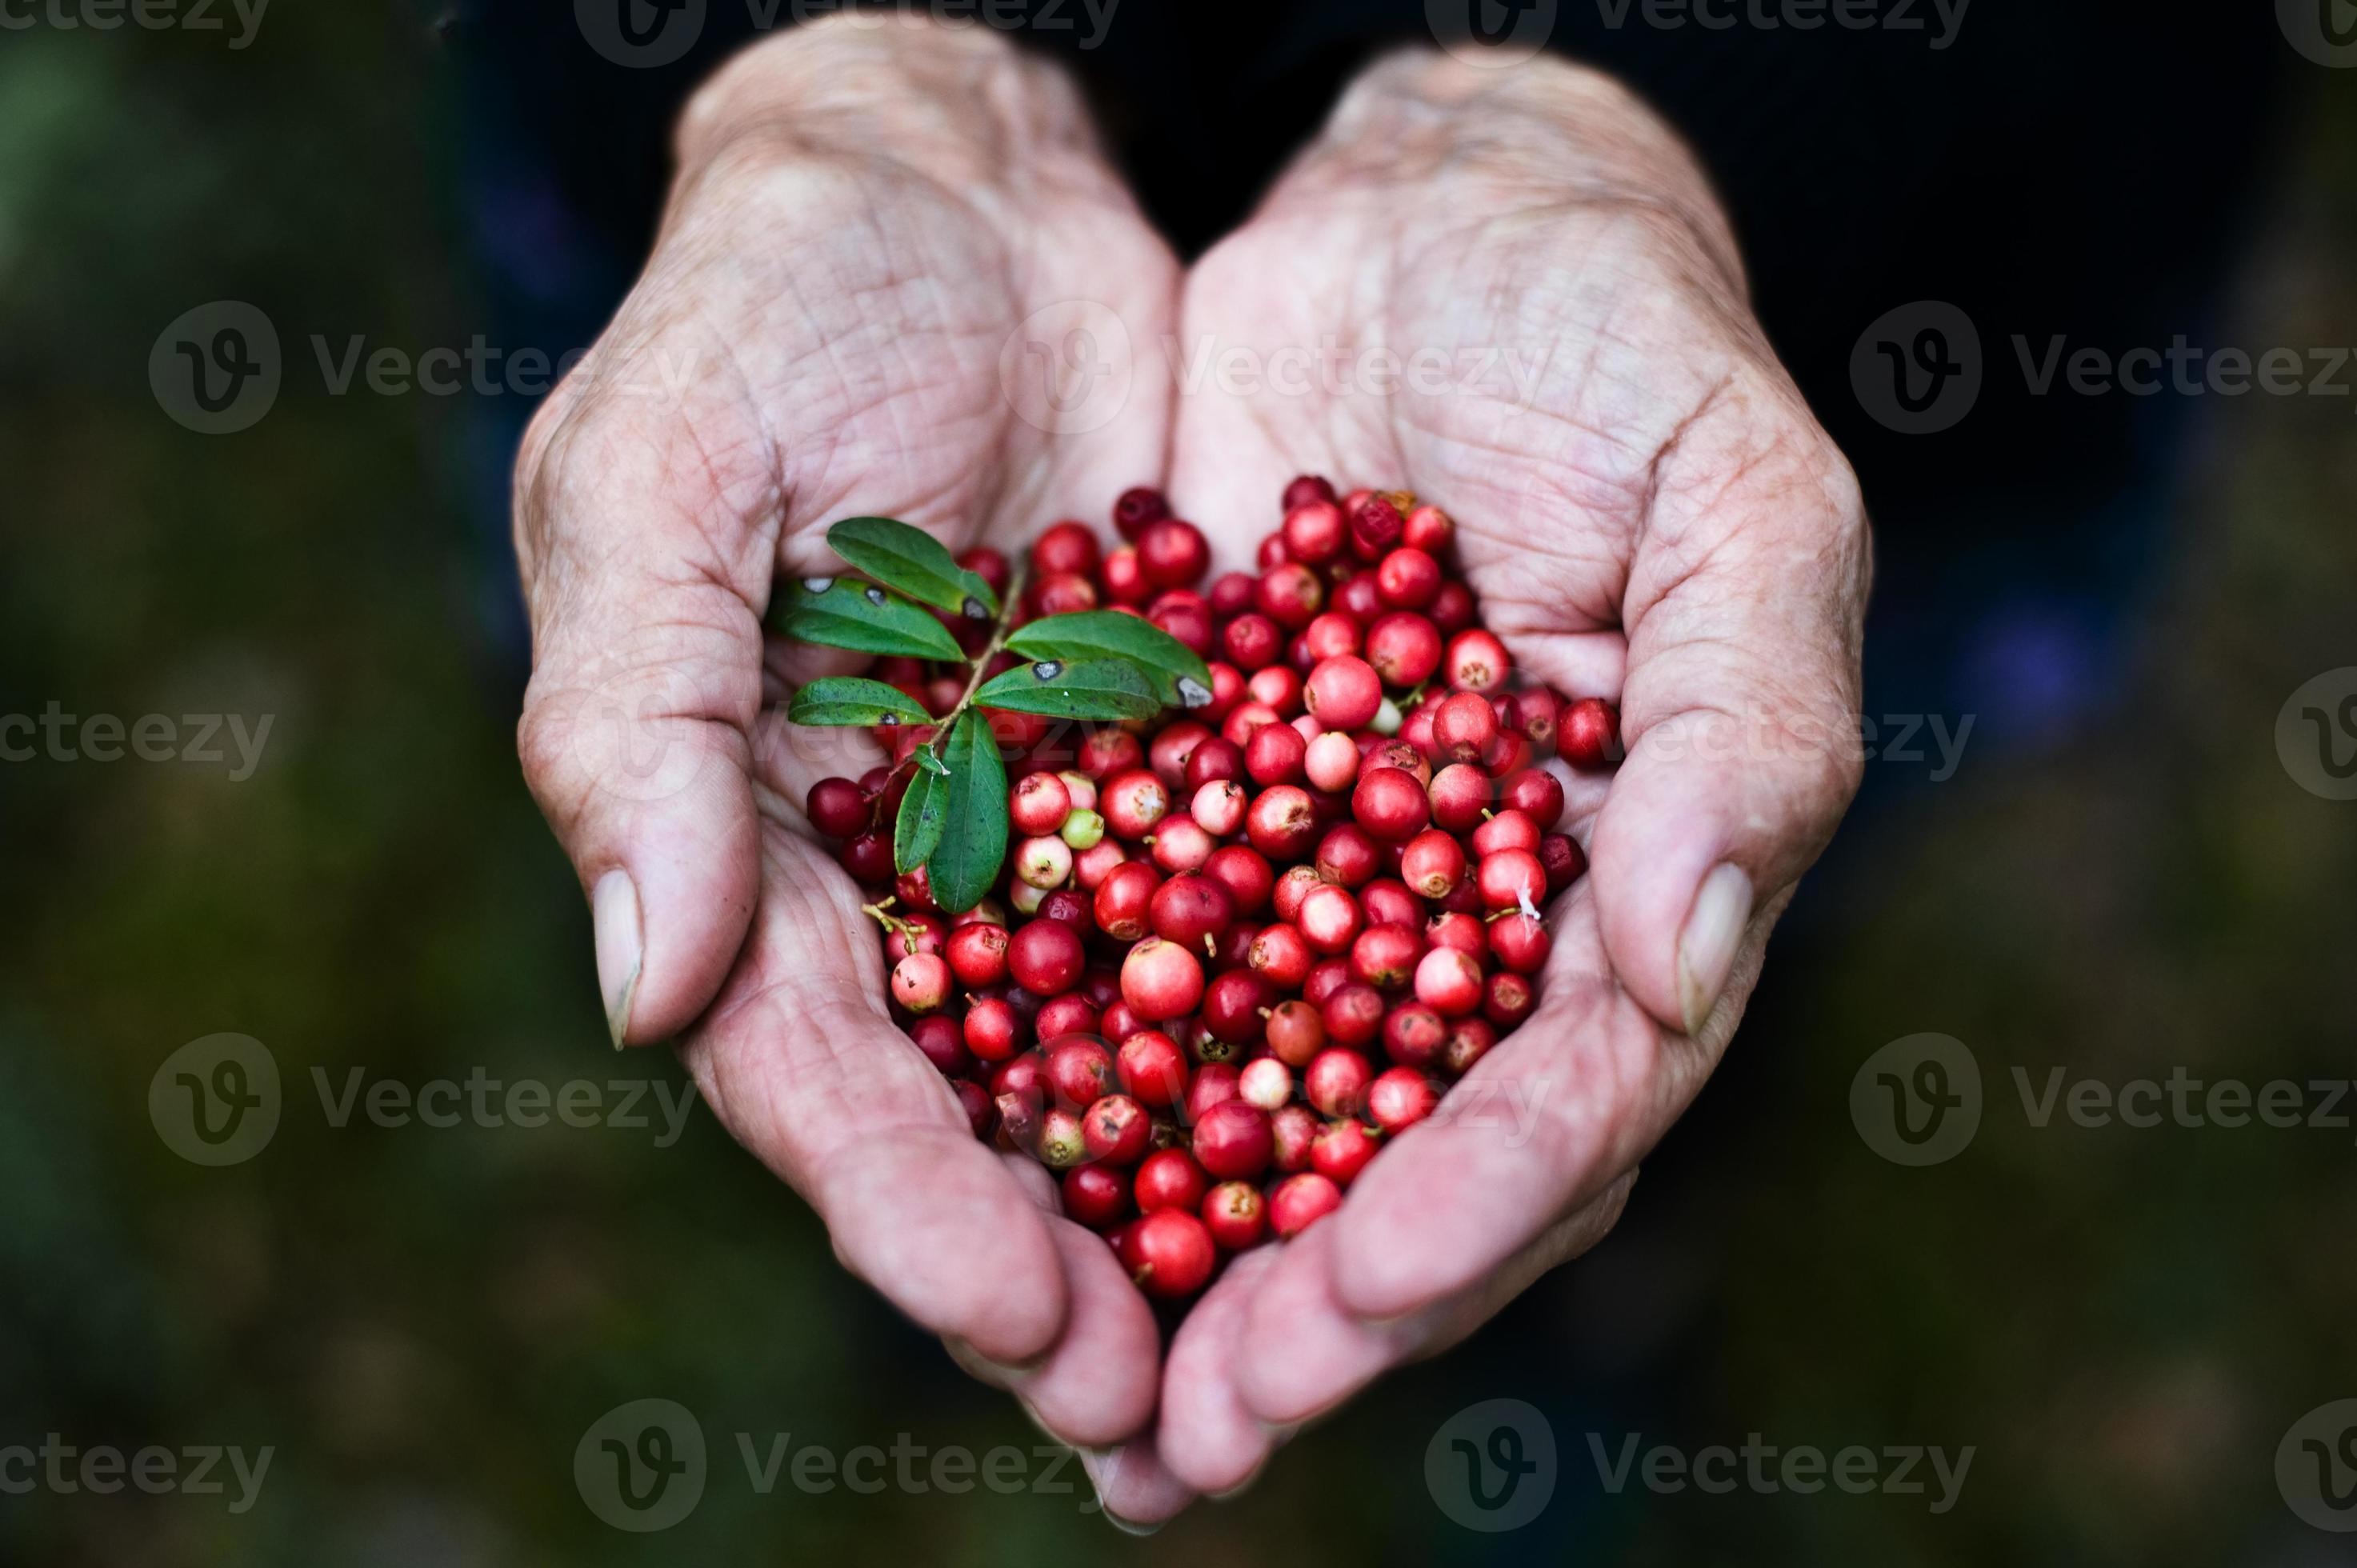 Cowberries on elderly woman hands 32 Stock Photo at Vecteezy